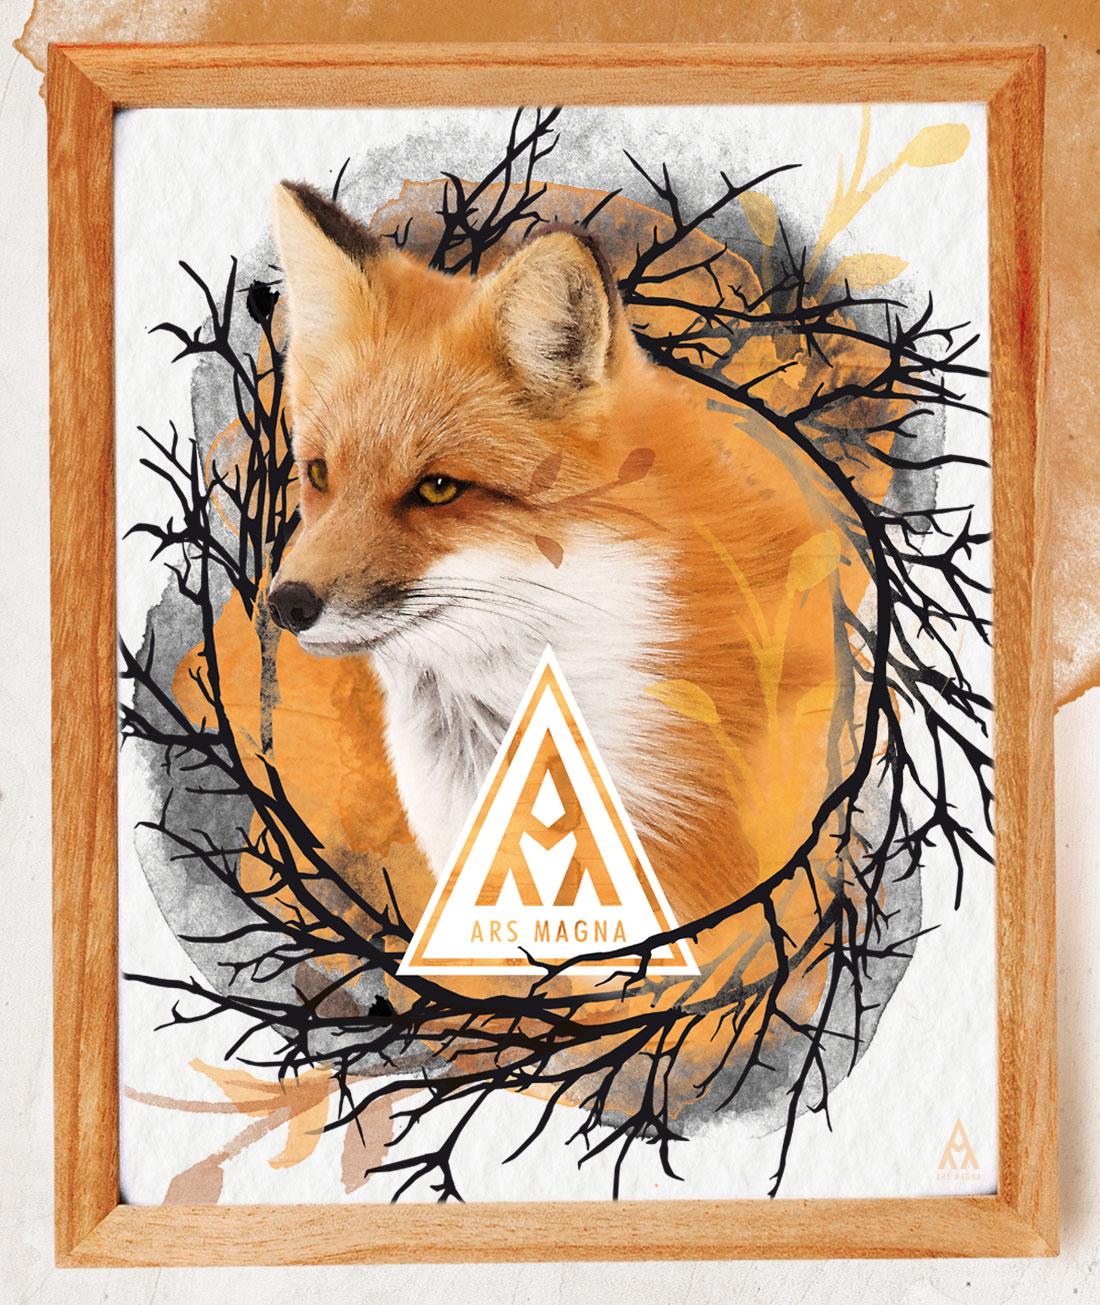 Ars Magna Design Watercolor Kunstdruck Motiv Fuchs Twig'N'Foxy